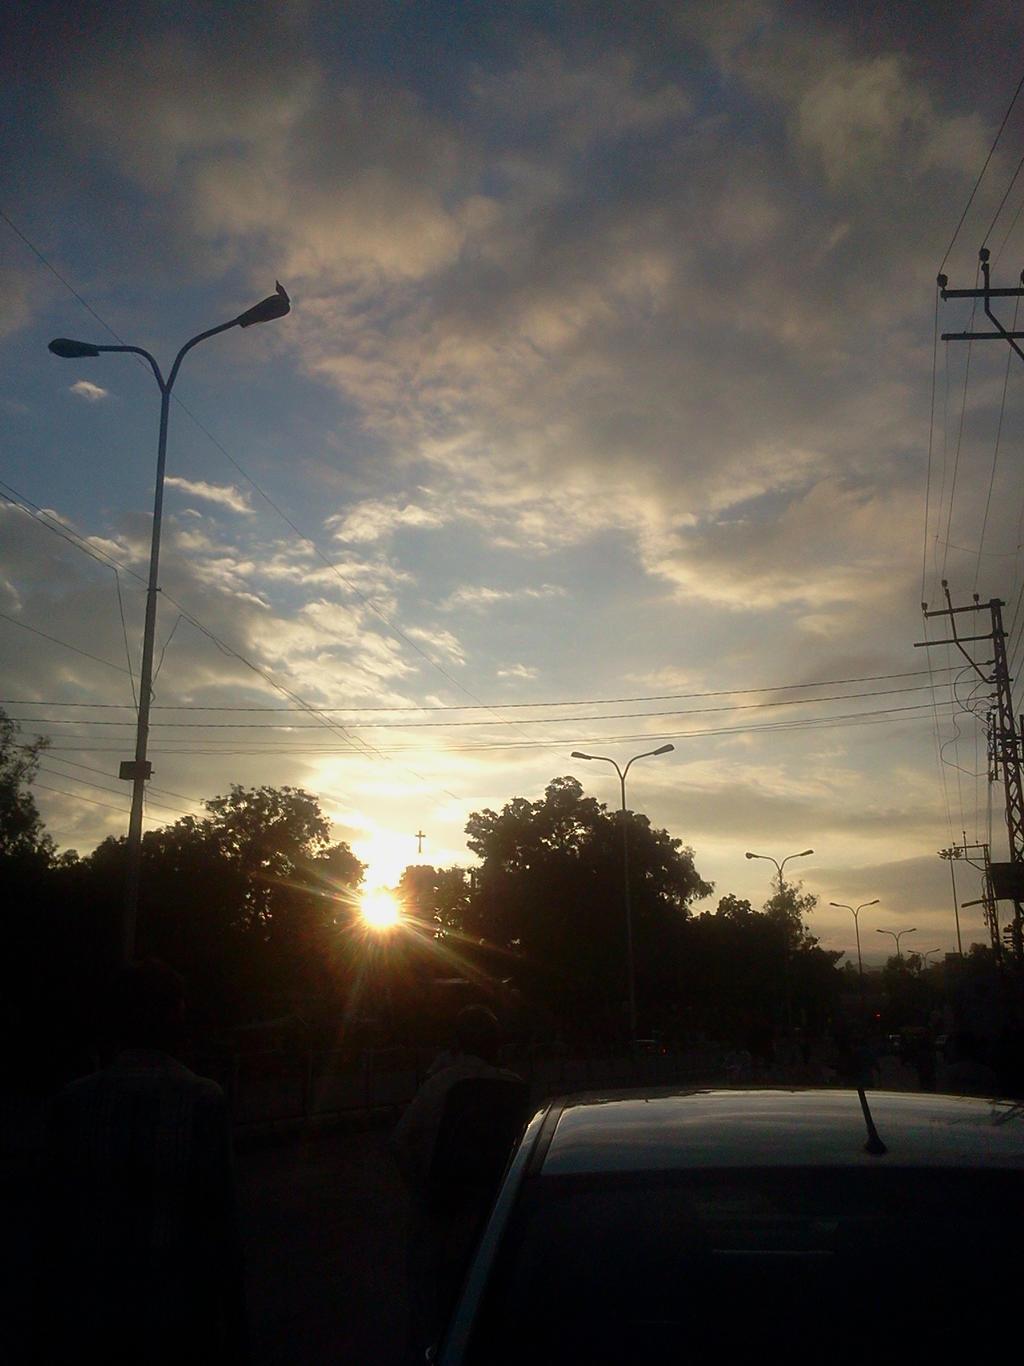 2013-09-30 17.56.49 by bharattt